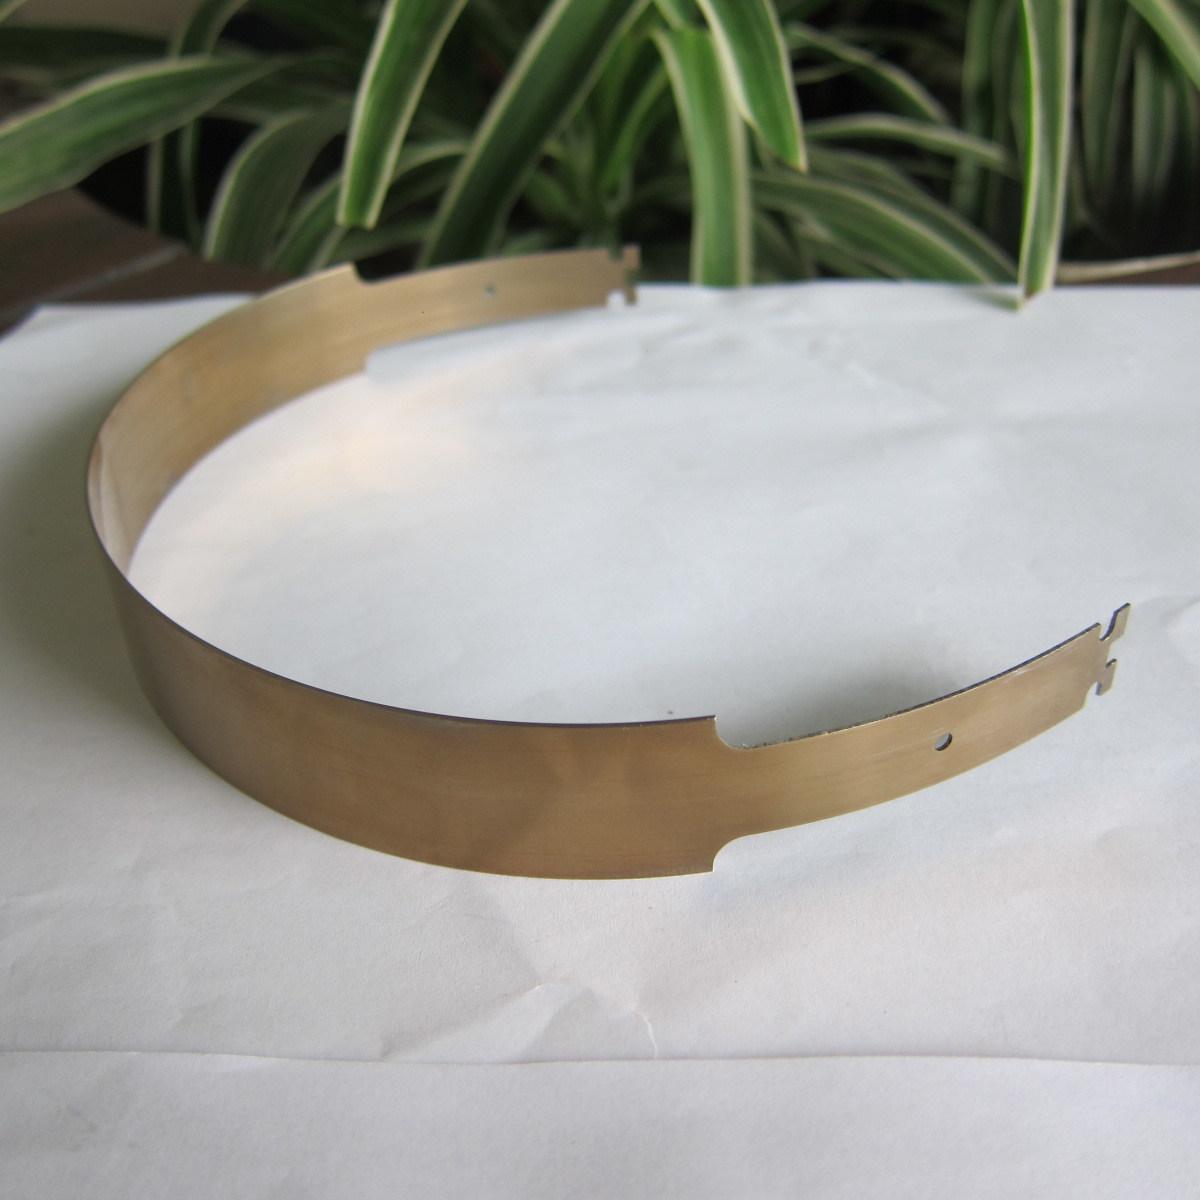 Strong Elastic Flat Spring High-End Headphone Headbands